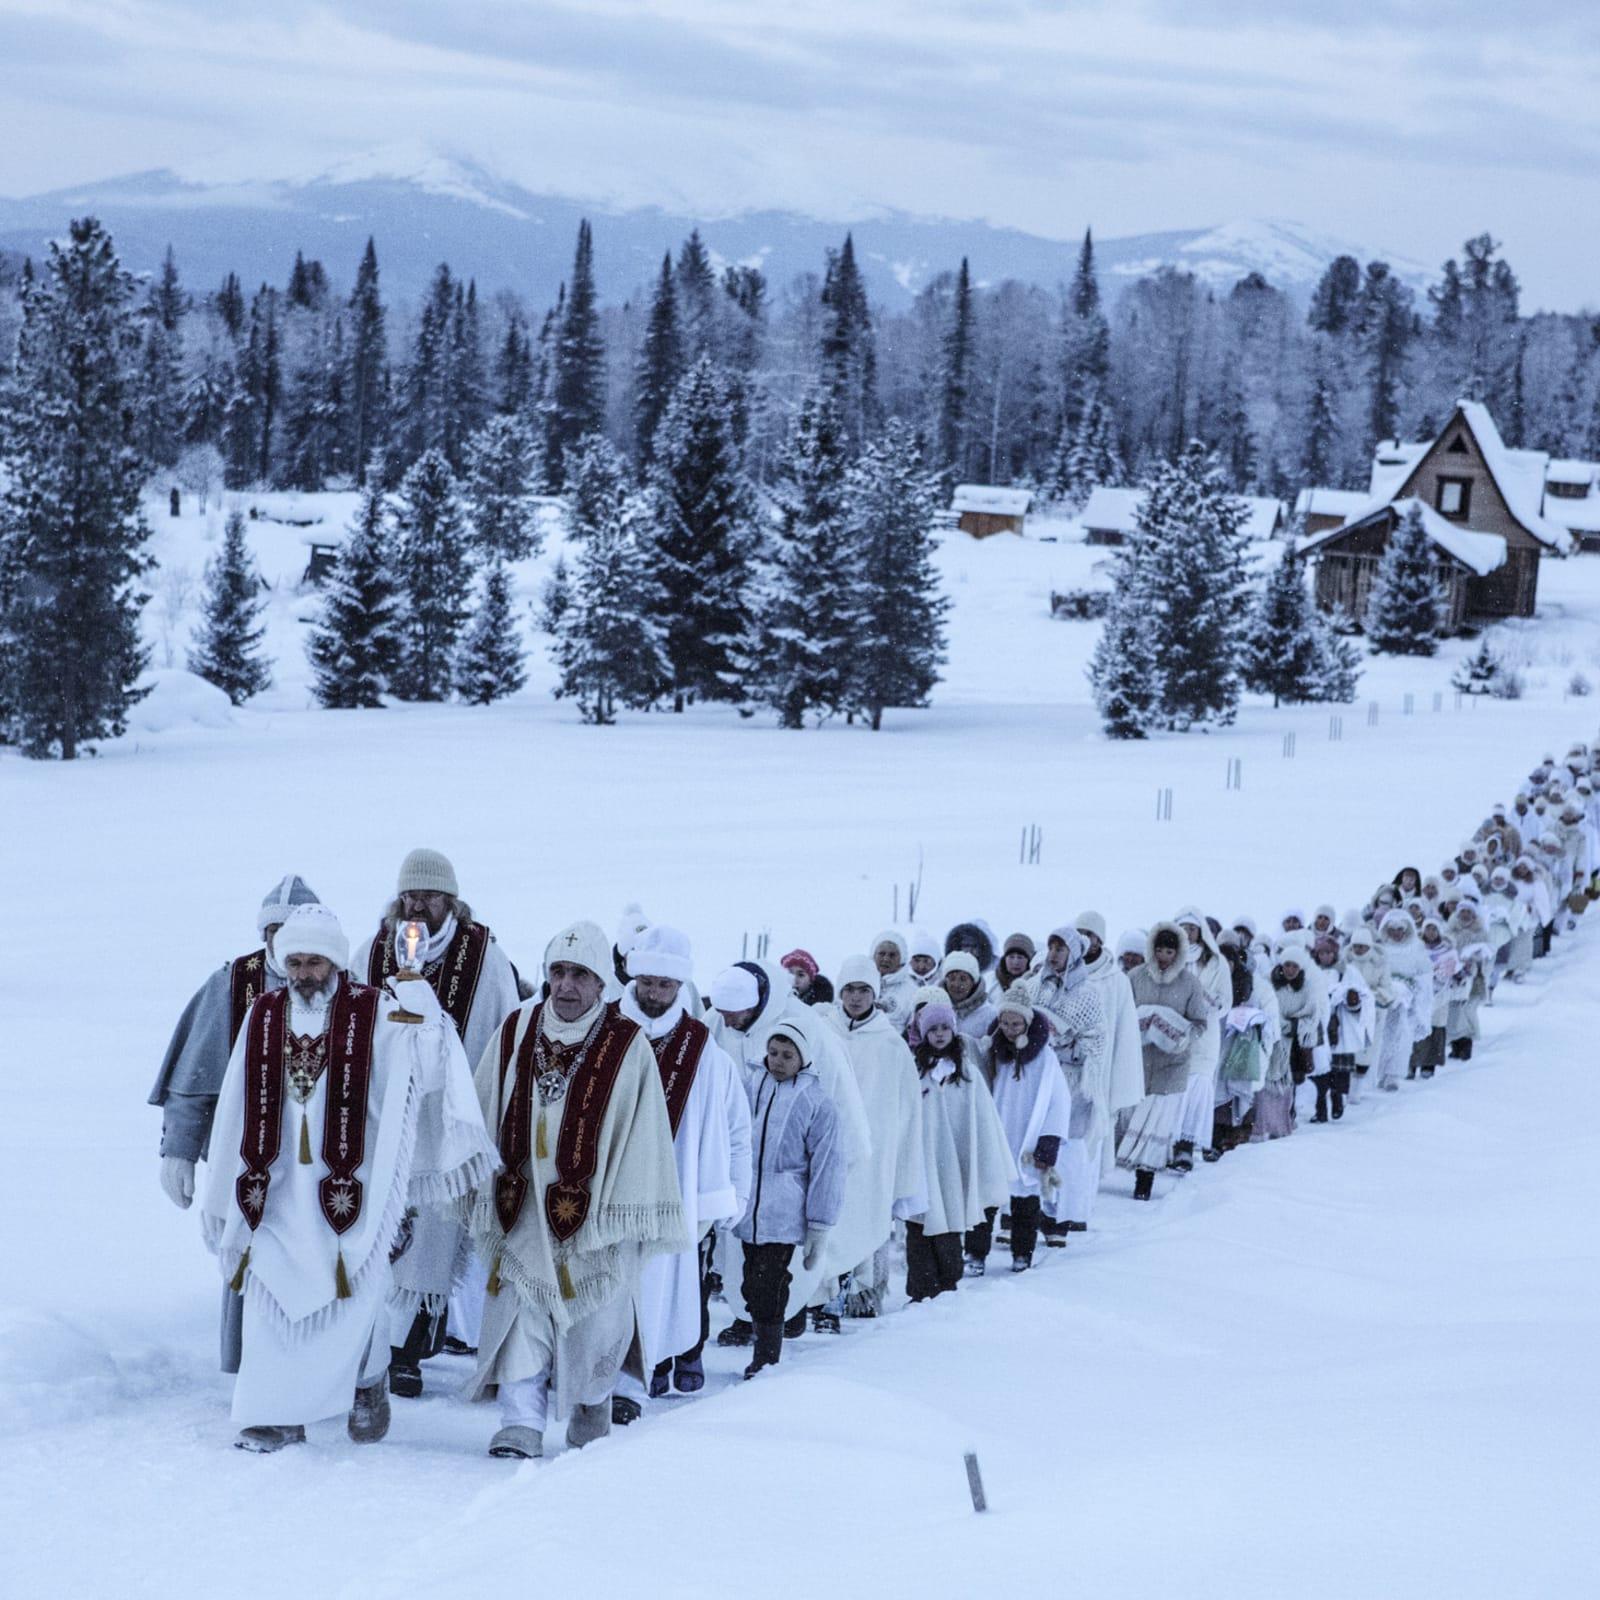 Jonas Bendiksen  Christmas pilgrimage, Russia, 2015  Pigment Print  71,5 x 100 cm  Edition of 8 plus 2 artist's proofs